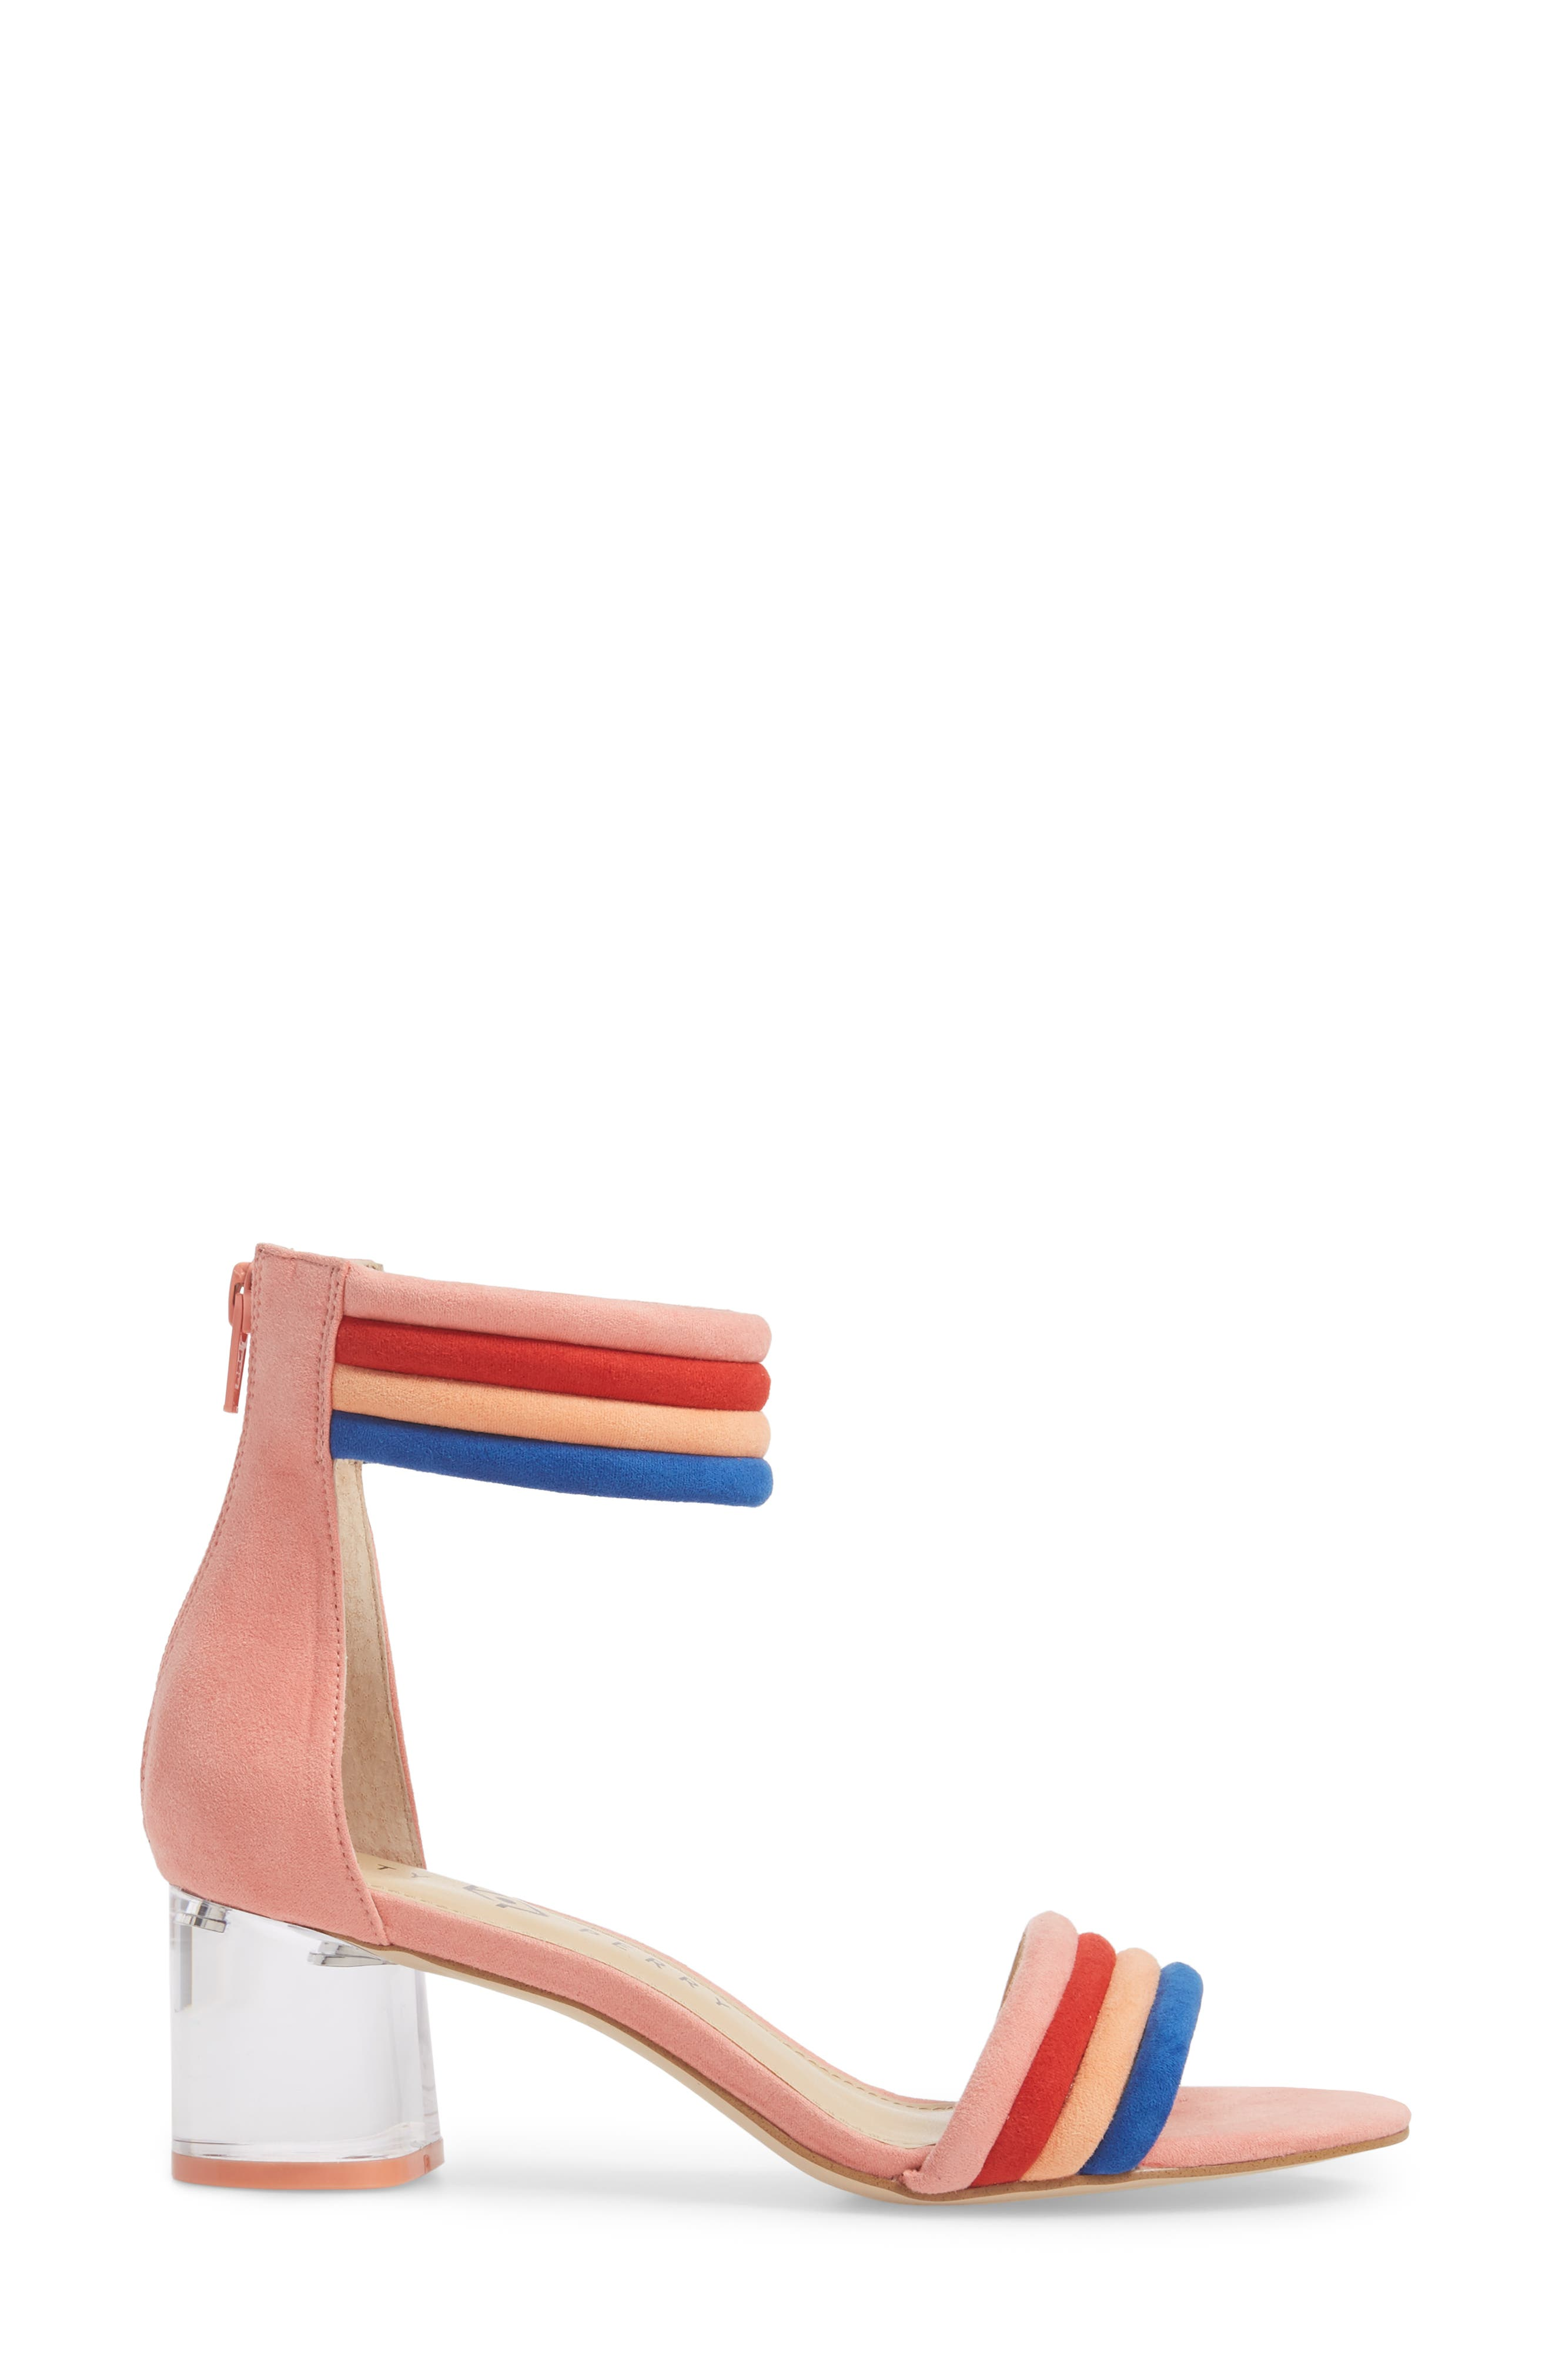 Tube Strap Sandal,                             Alternate thumbnail 3, color,                             Pop Pink Suede